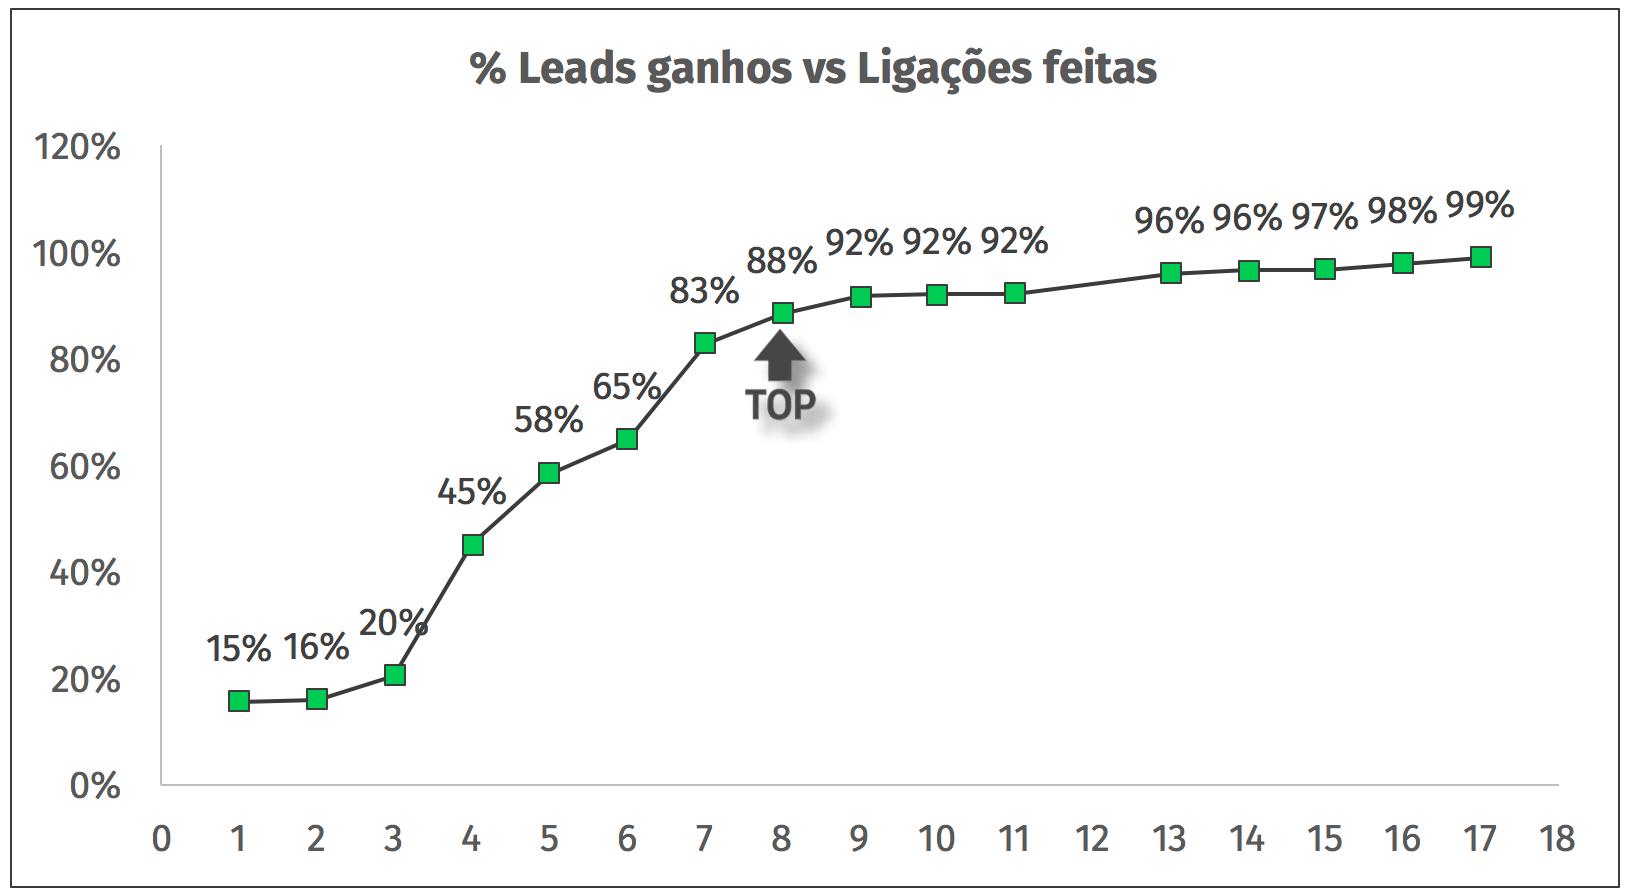 numero de ligacoes vs leads ganhos